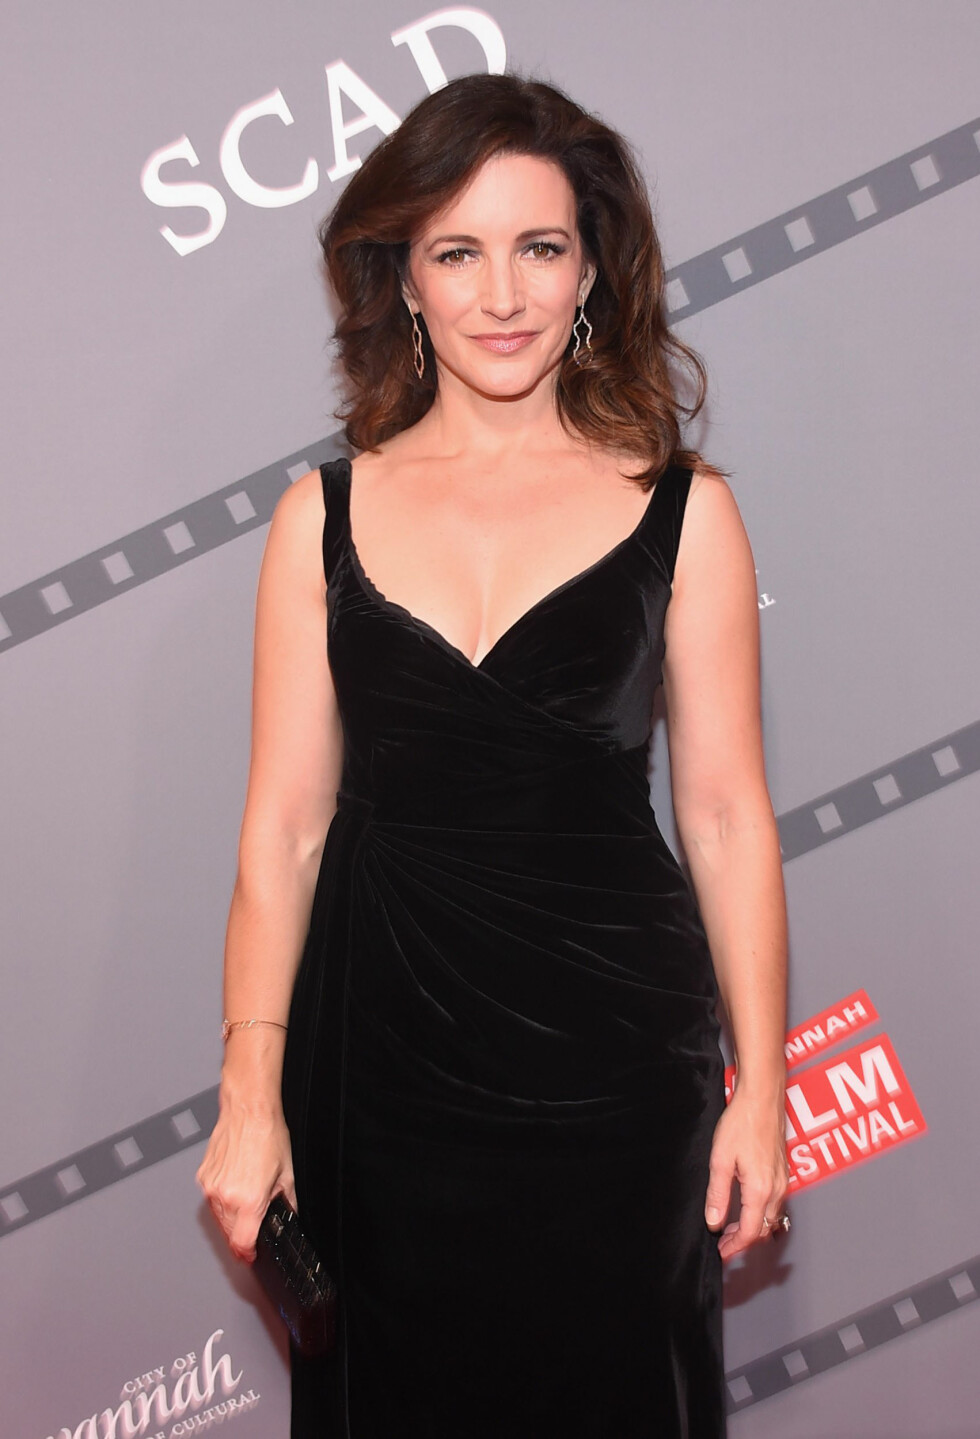 ALDRI VÆRT GIFT: Skuespiller Kristin Davis (51). Foto: NTB Scanpix